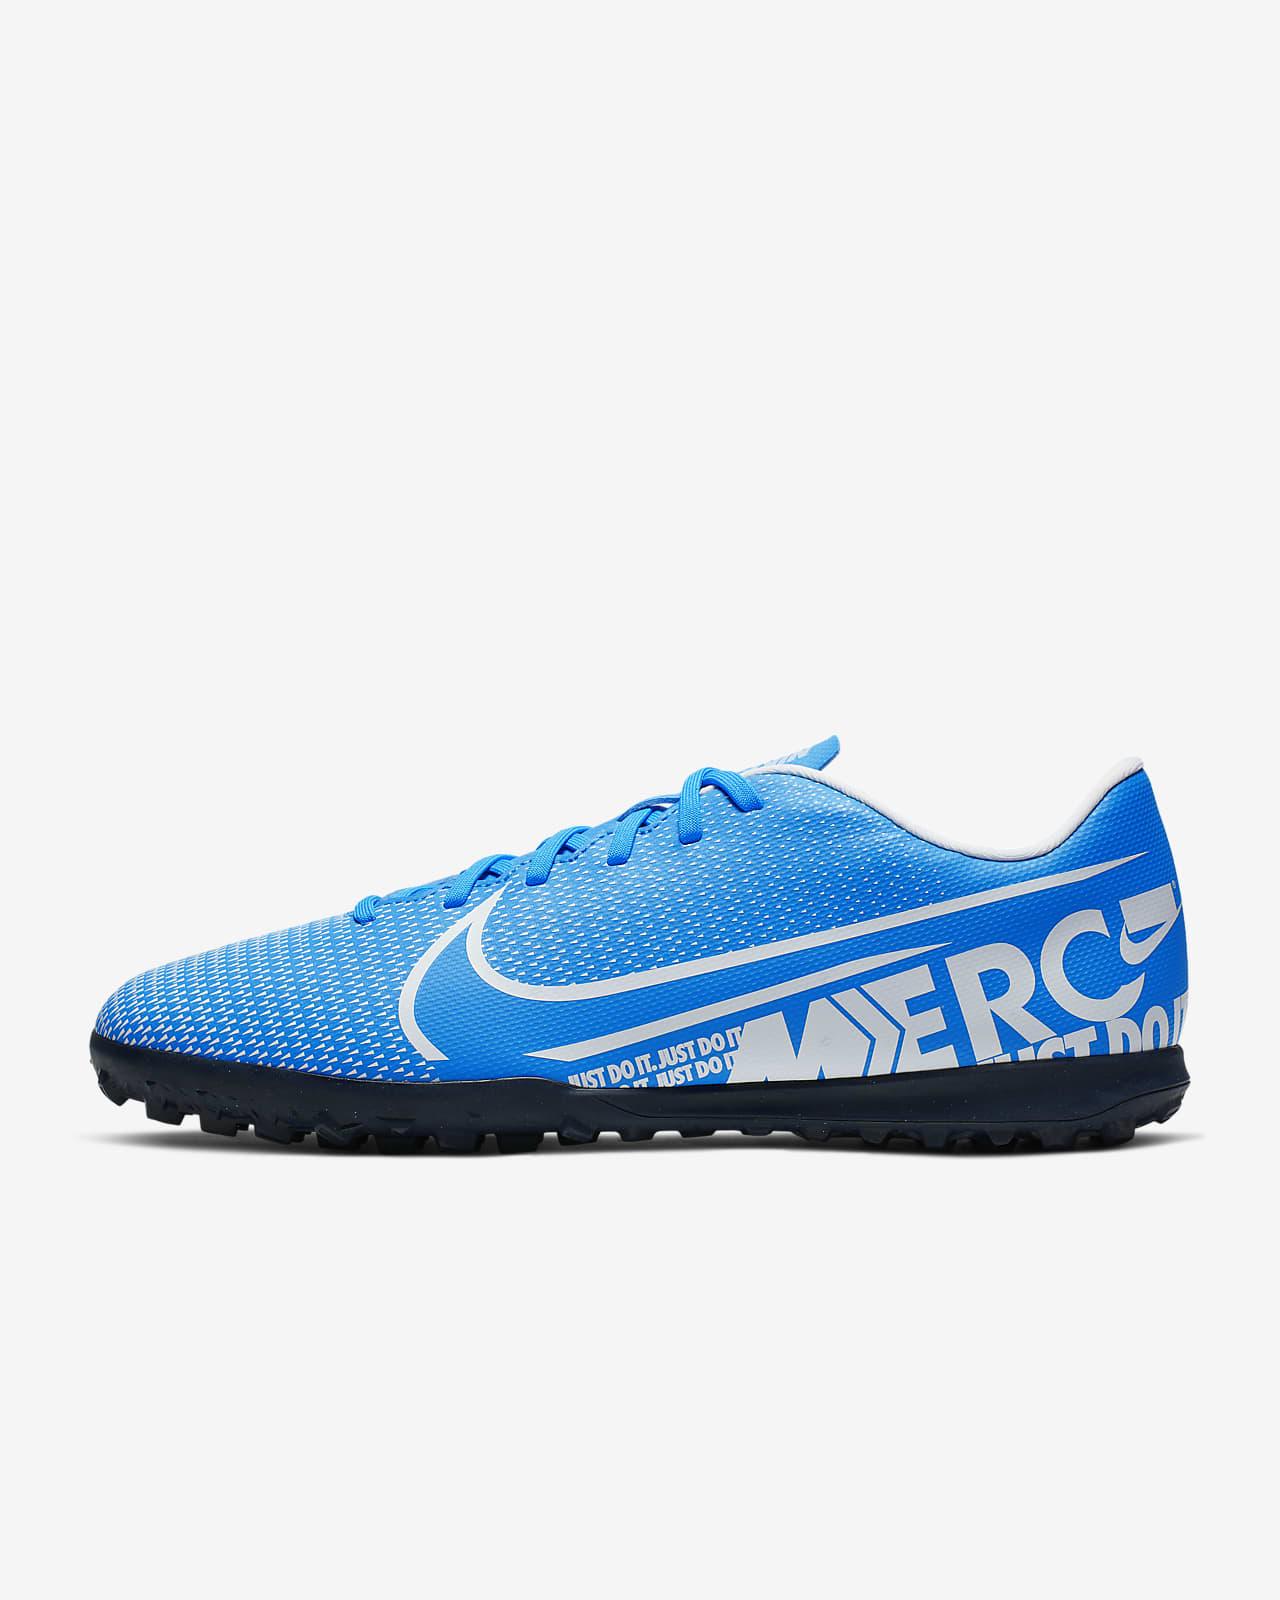 Nike Mercurial Vapor 13 Club TF Artificial-Turf Football Shoes